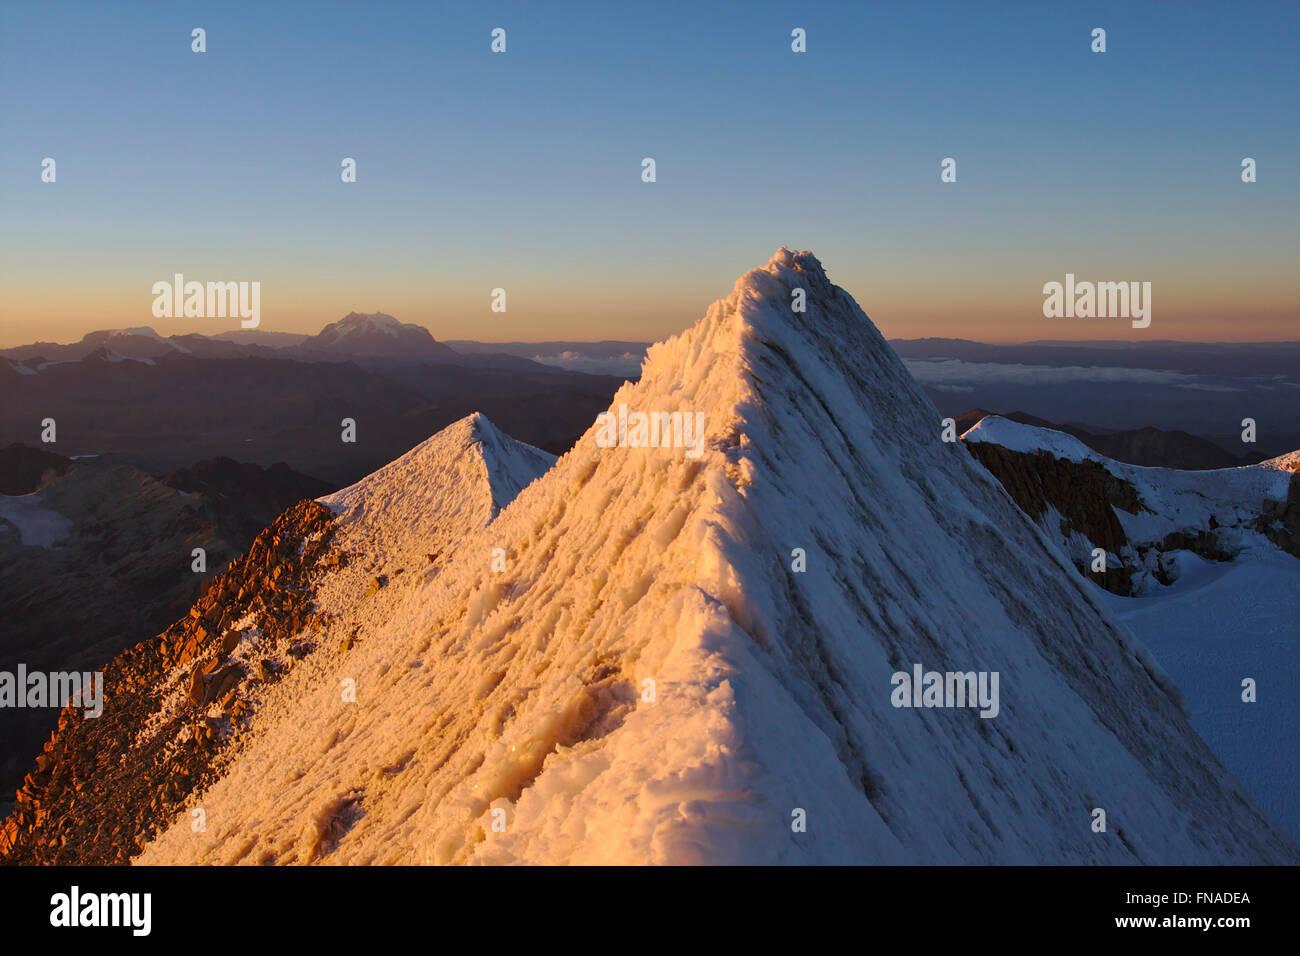 Summit ridge of Huayna Potosi in the Cordillera Real, sunrise, Illimani in the distance, Bolivia - Stock Image